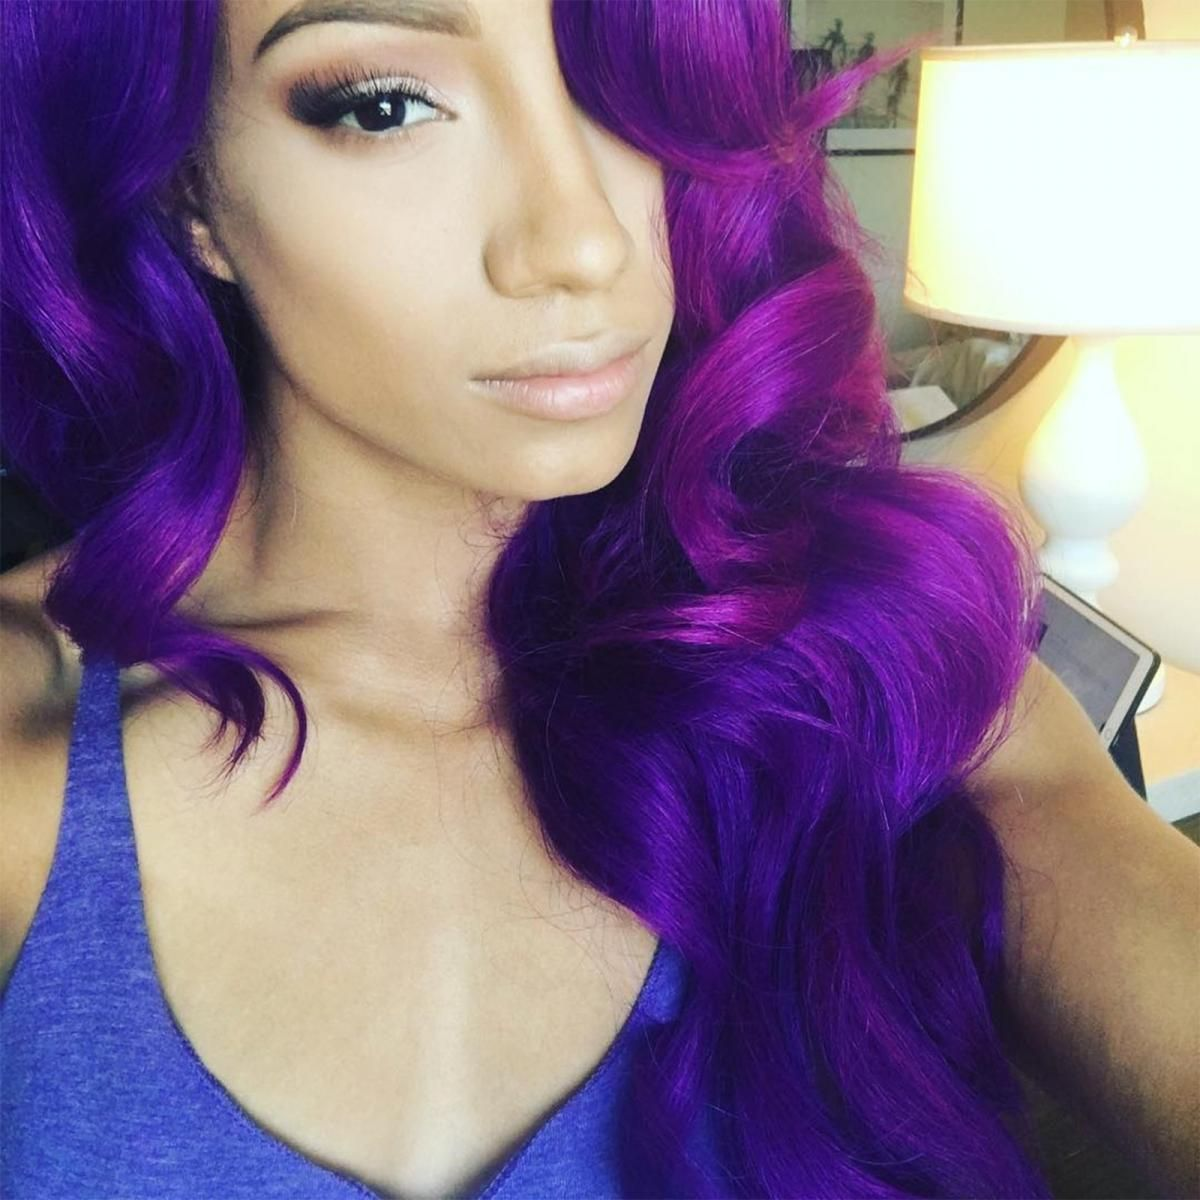 The Boss Hottest Instagram Photos Wwe Sasha Banks Sasha Banks Instagram Sasha Bank